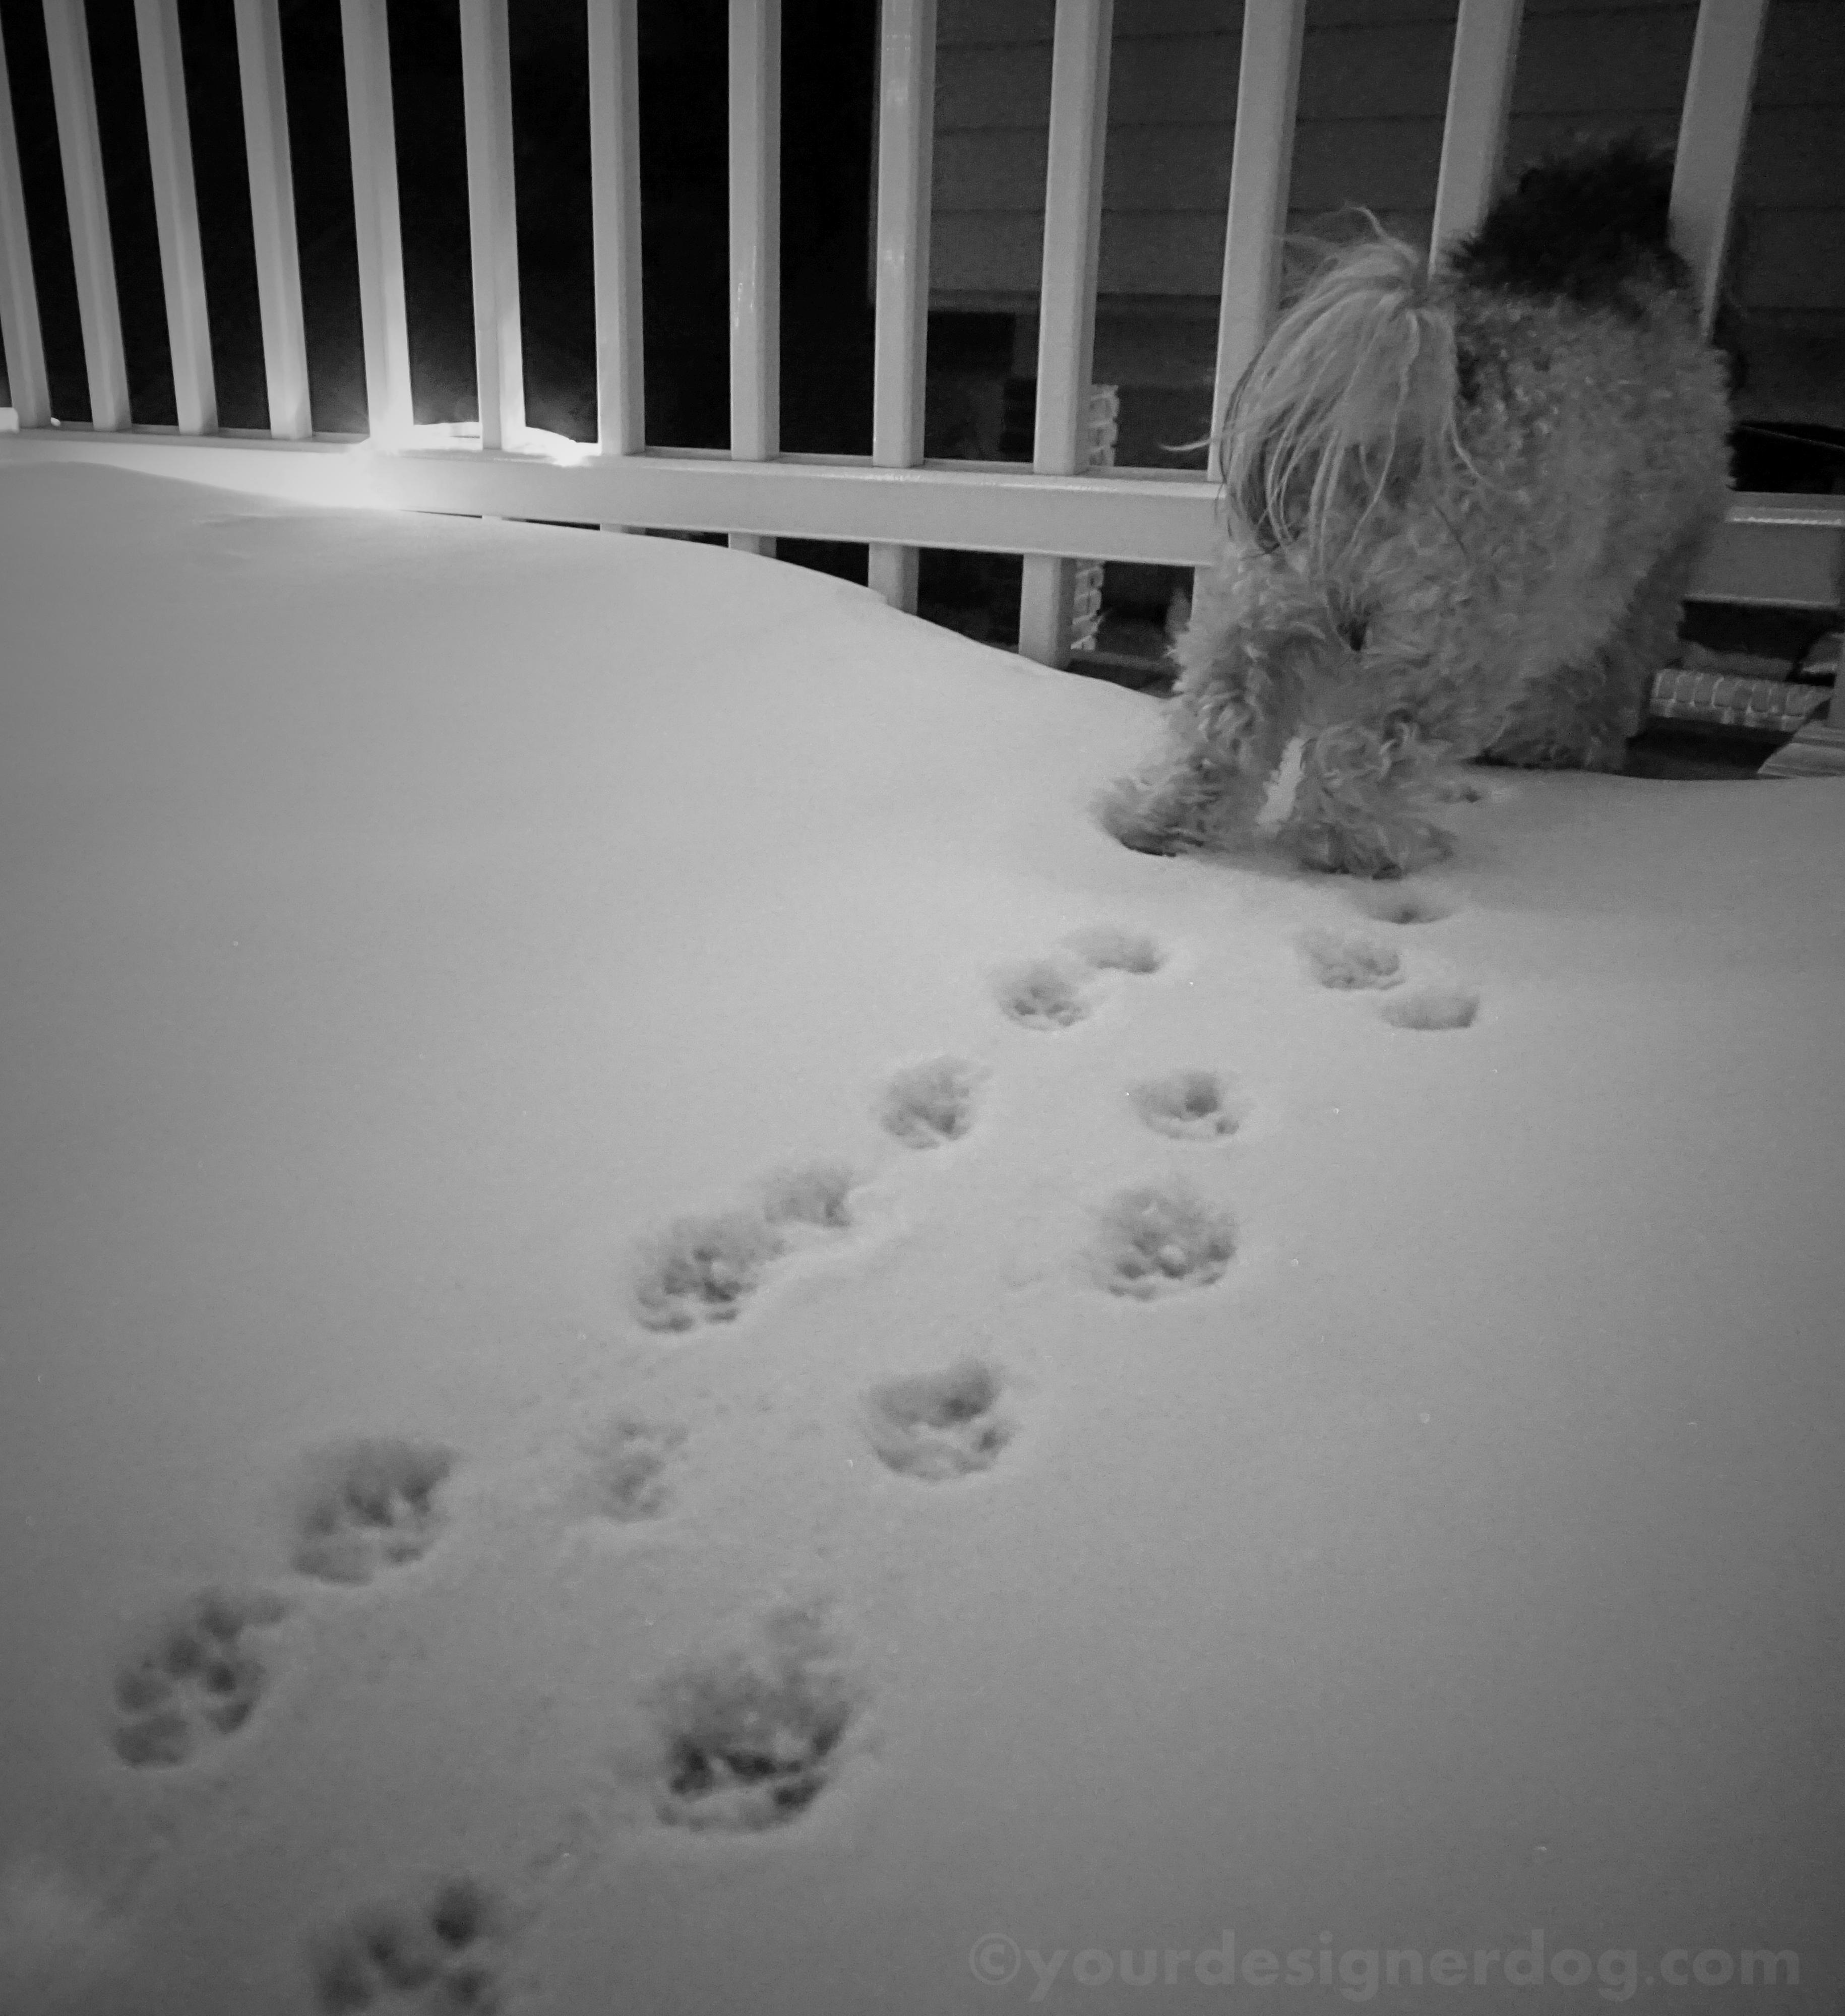 Snowy Paw Prints